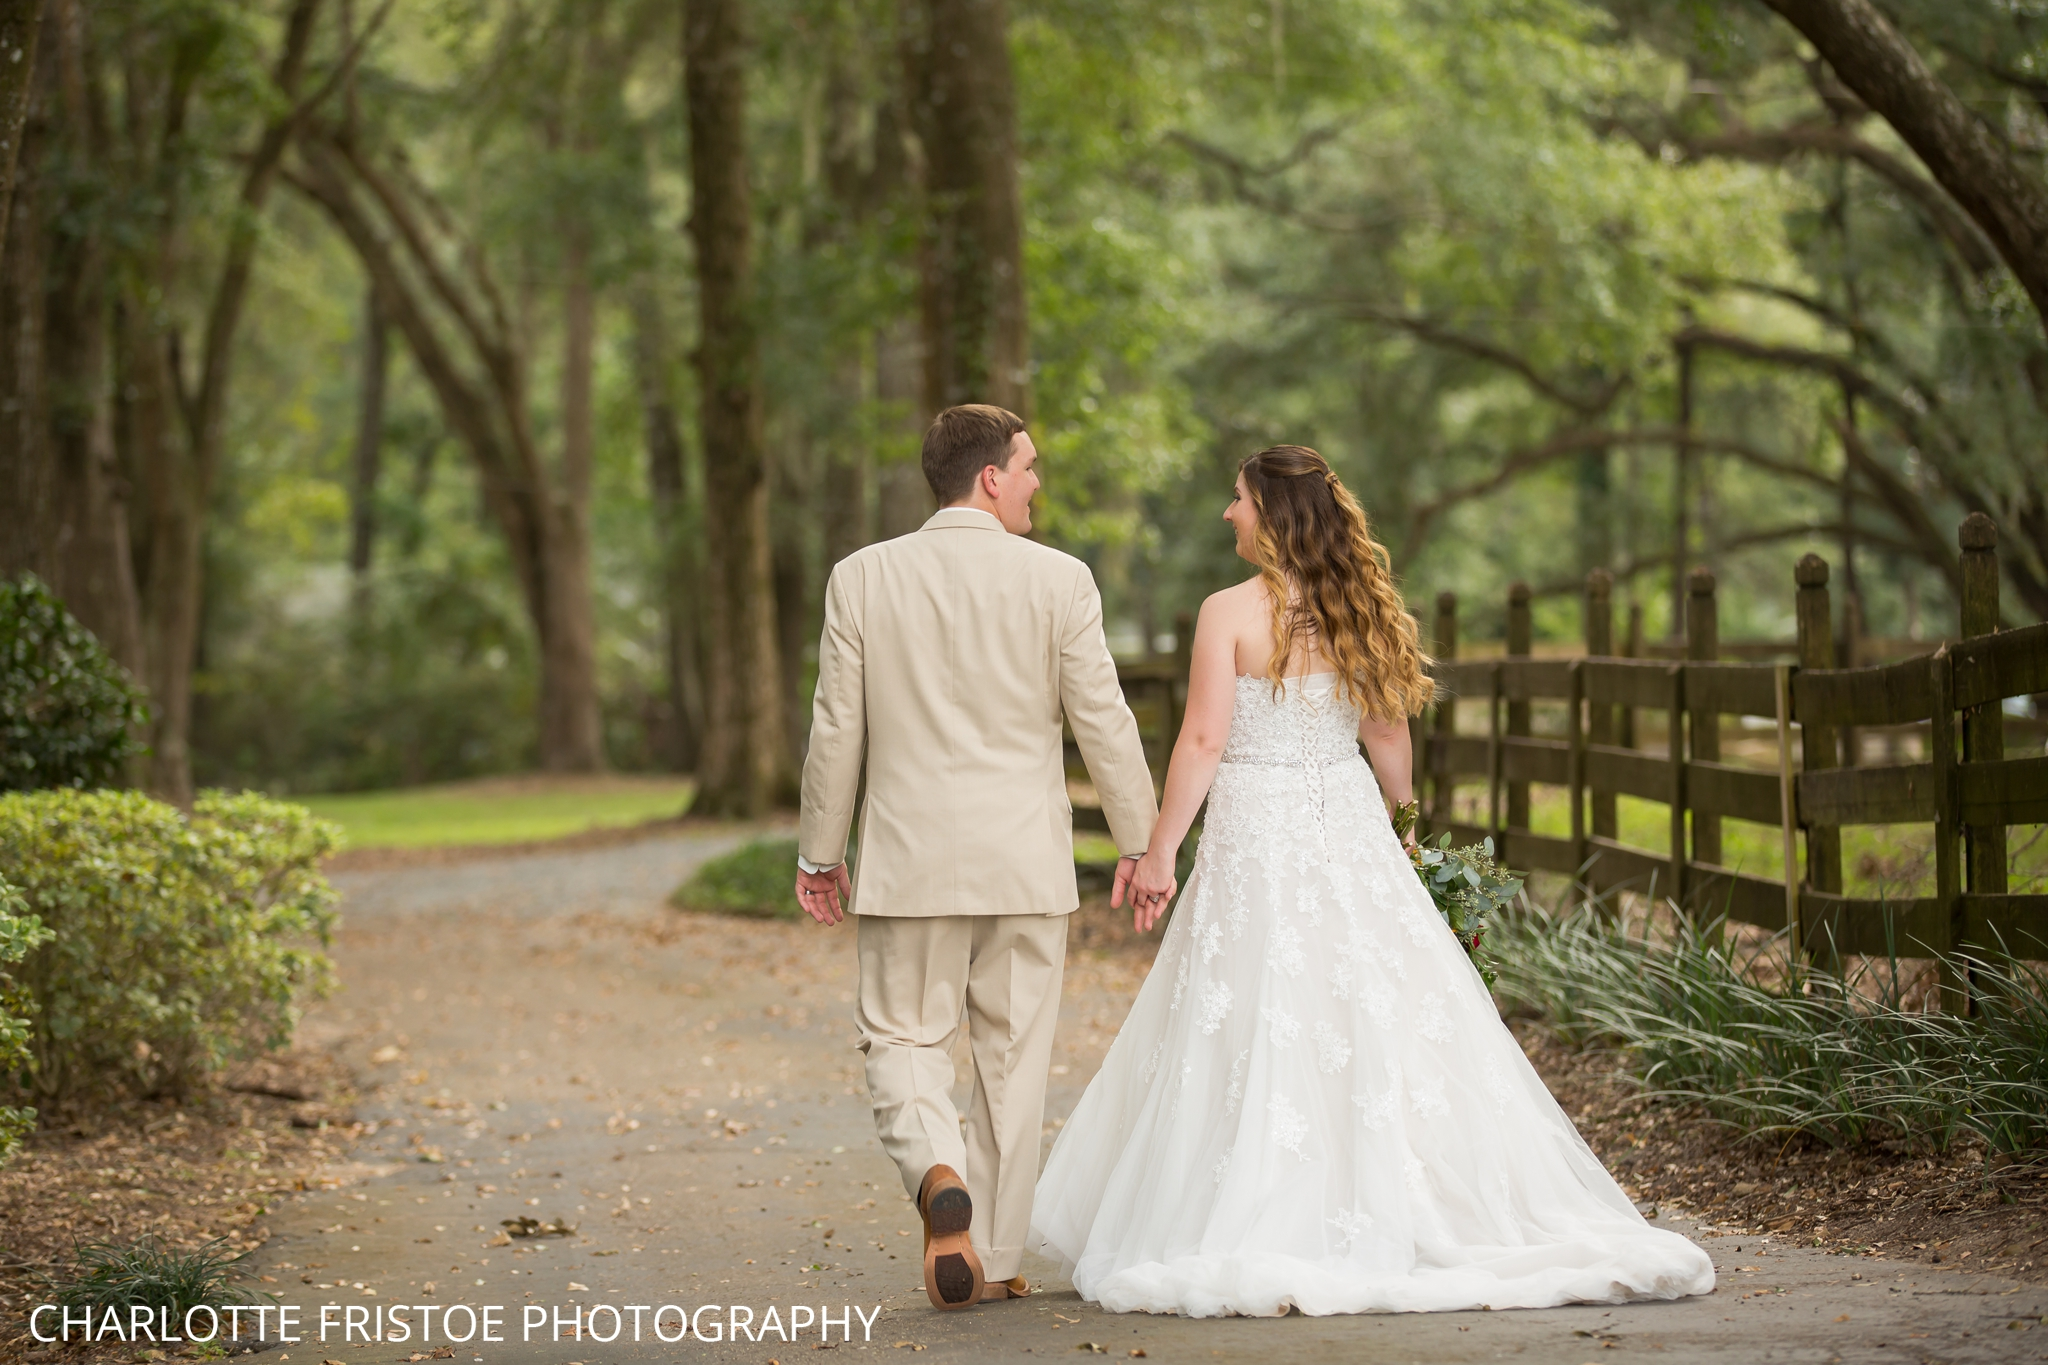 Tallahassee_Wedding_Charlotte_Fristoe-54.jpg